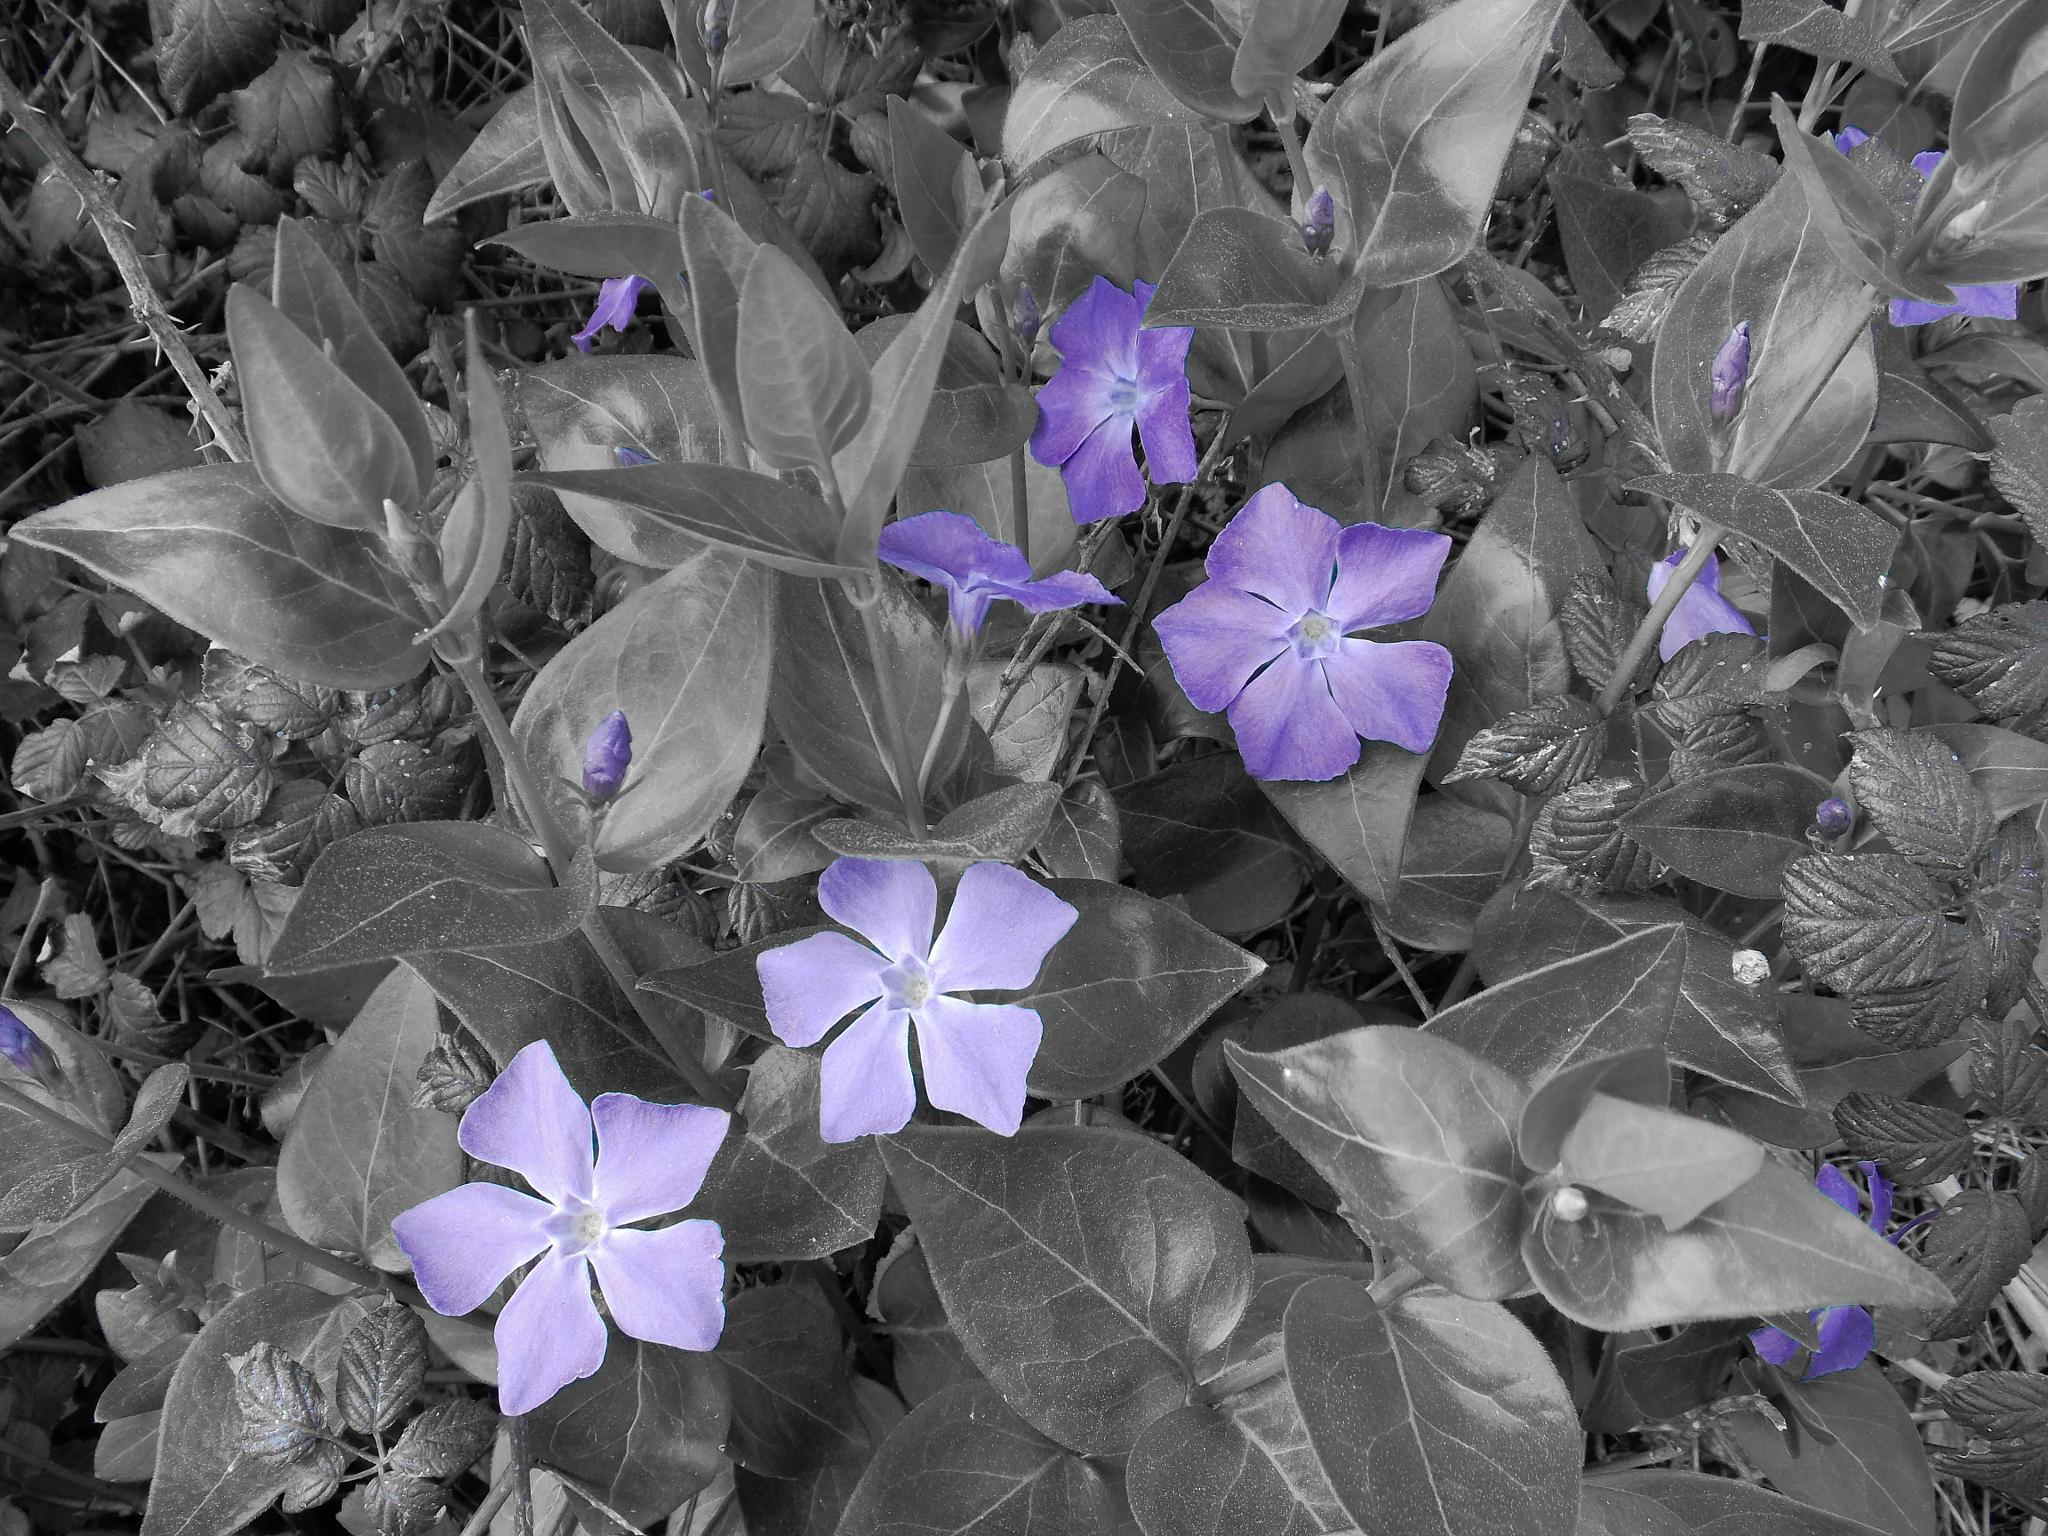 Violeta by joserafael.santamariaruiz